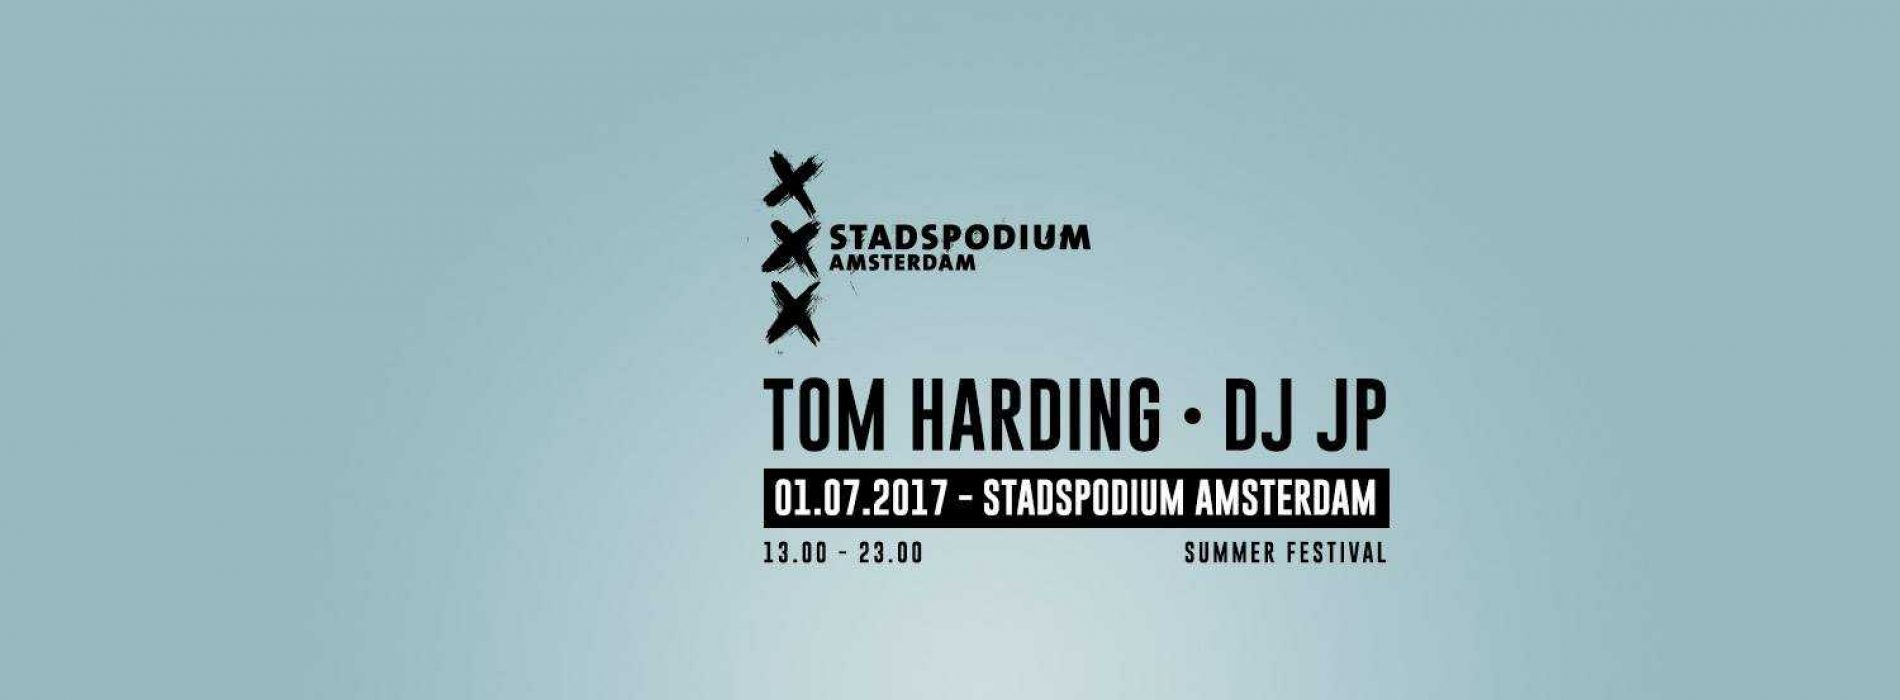 Tom Harding & DJ JP   Stadspodium Amsterdam